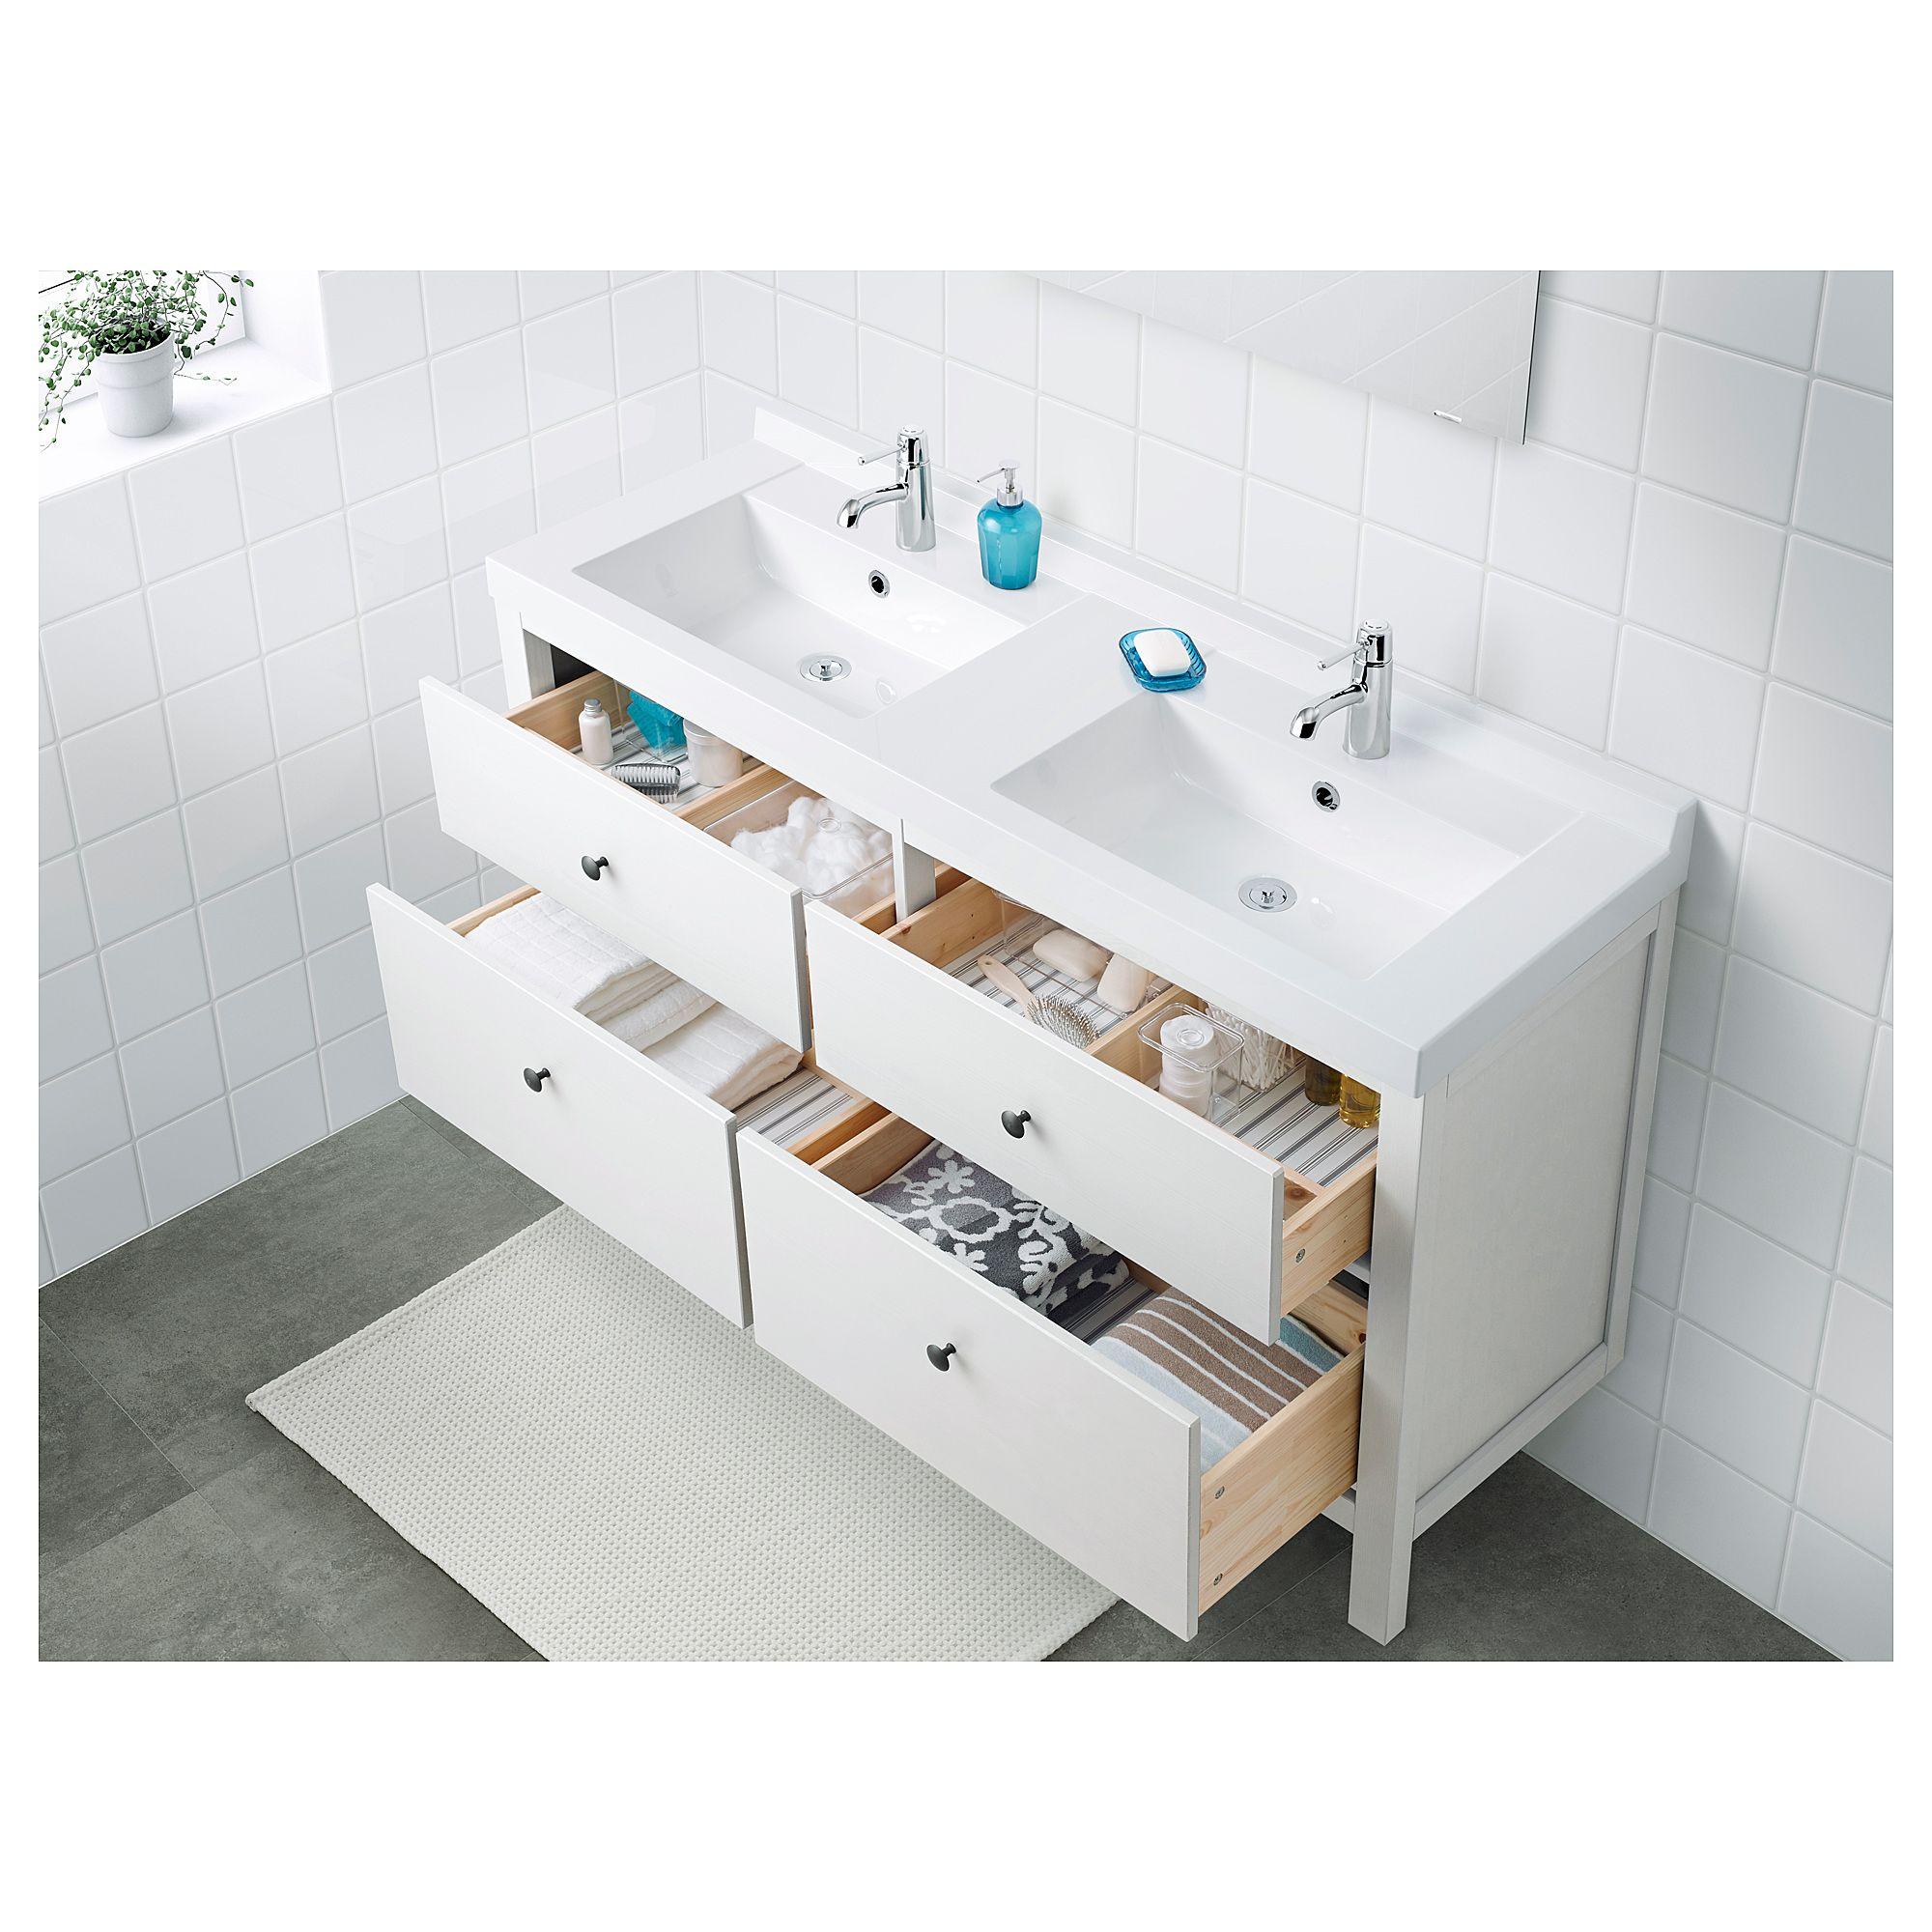 Furniture Home Furnishings Find Your Inspiration Sink Cabinet Bathroom Sink Cabinets Ikea Hemnes